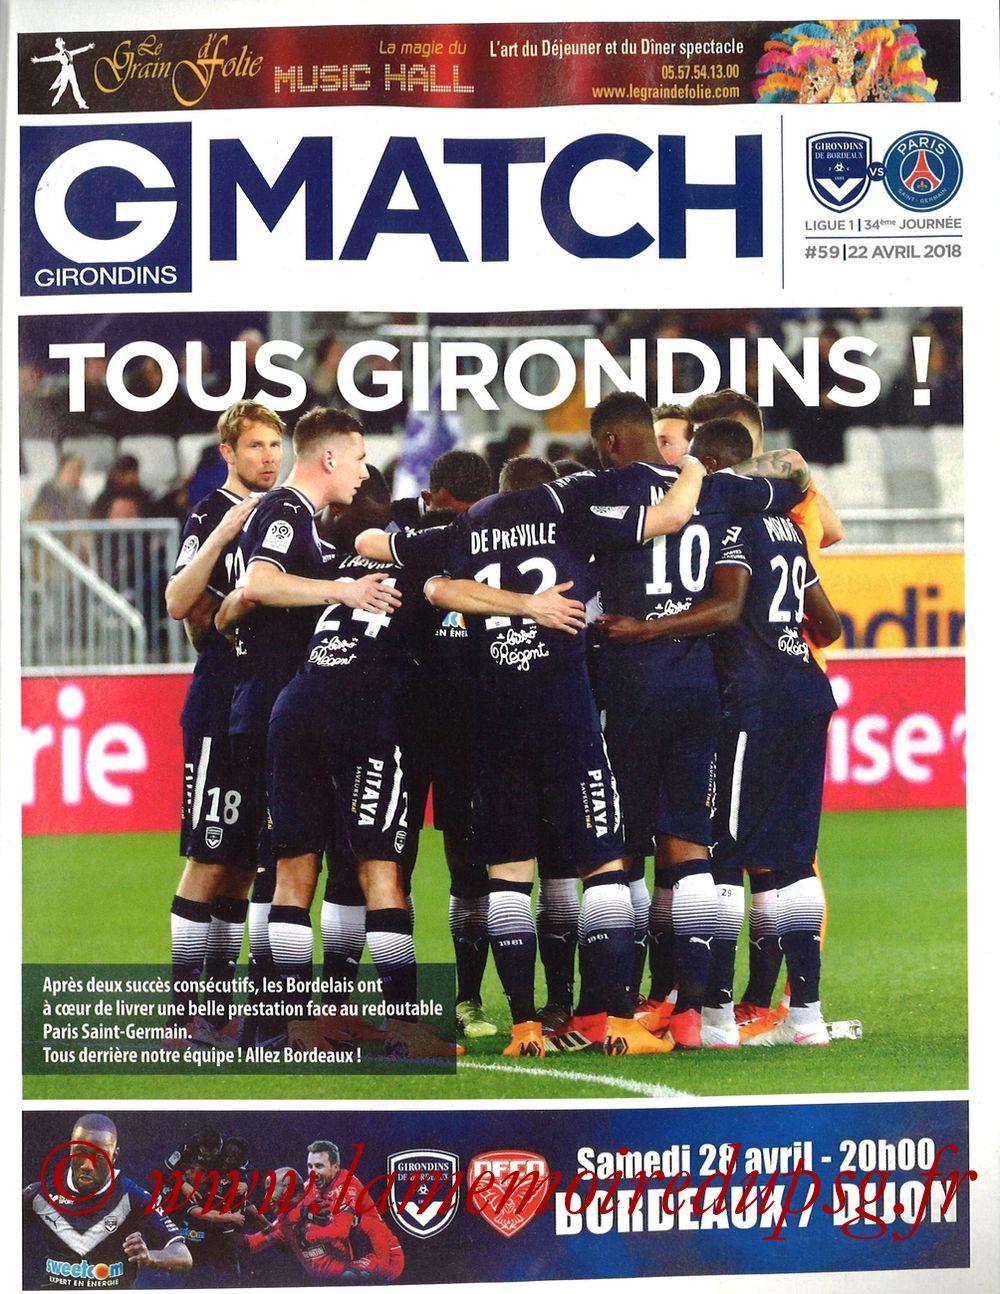 2018-04-22  Bordeaux-PSG (34ème L1, Girondins Match N°59)